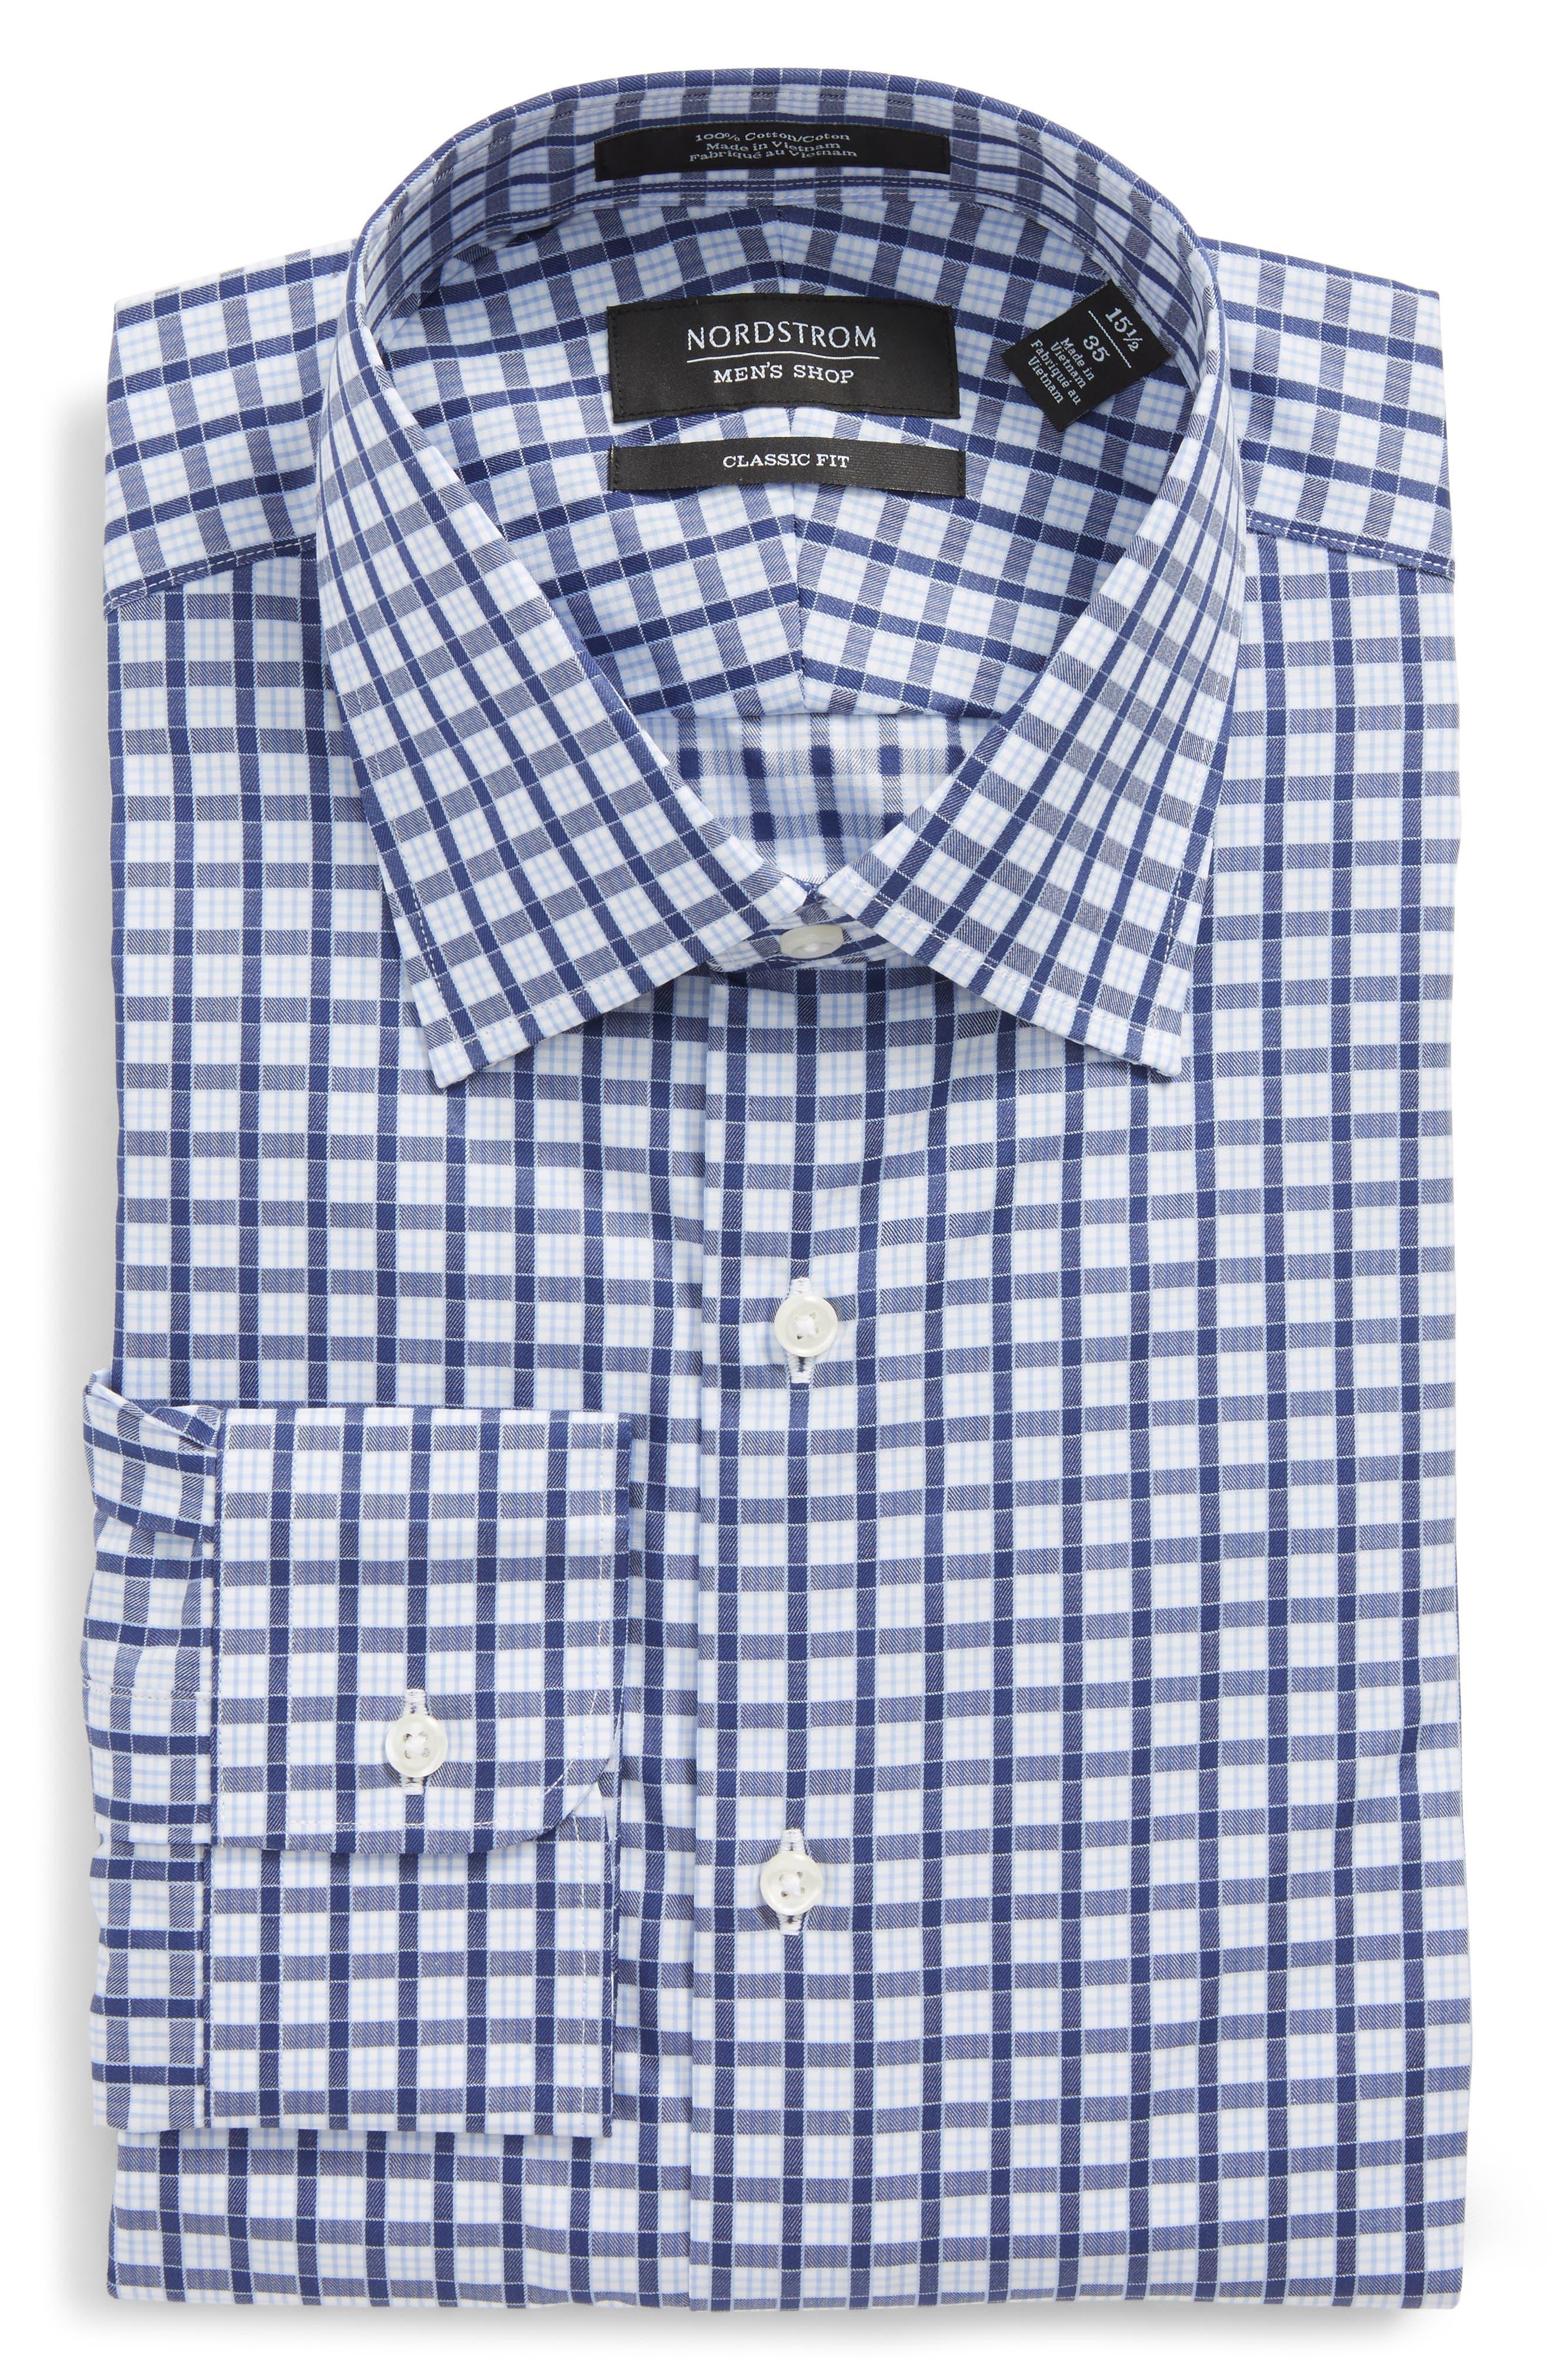 Nordstrom Men's Shop Classic Fit Check Dress Shirt